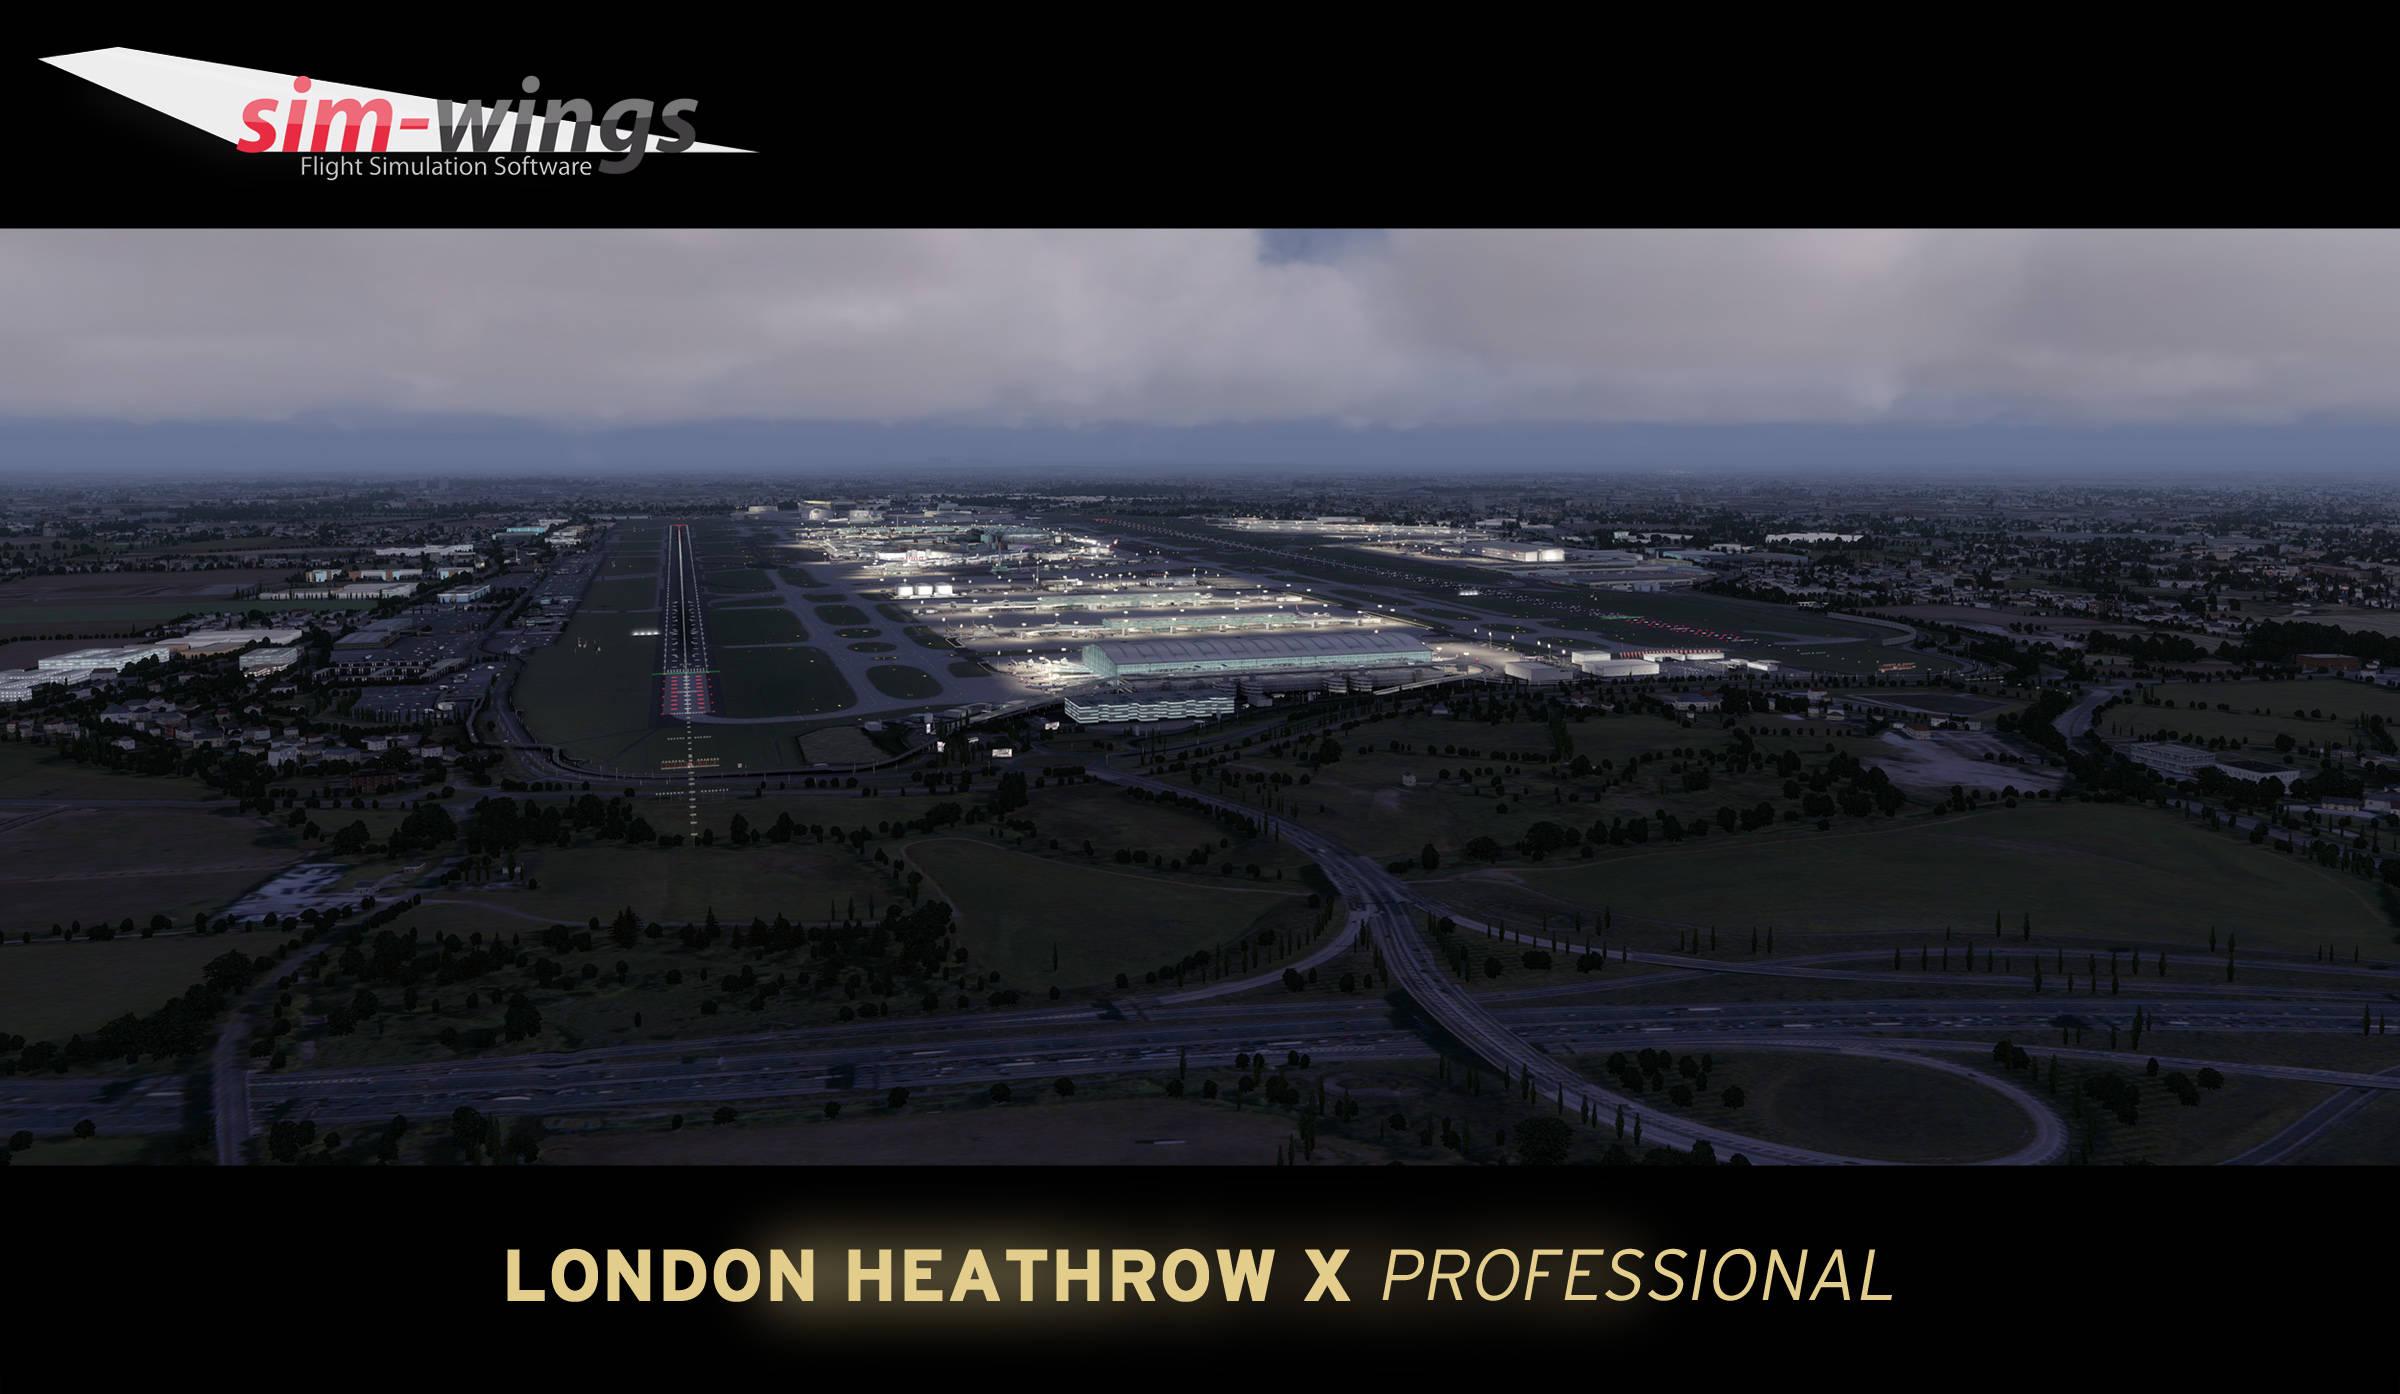 https://dxhb0it26is40.cloudfront.net/productimages/mega-airport-london-heathrow-professional_14_ss_l_171002125925.jpg